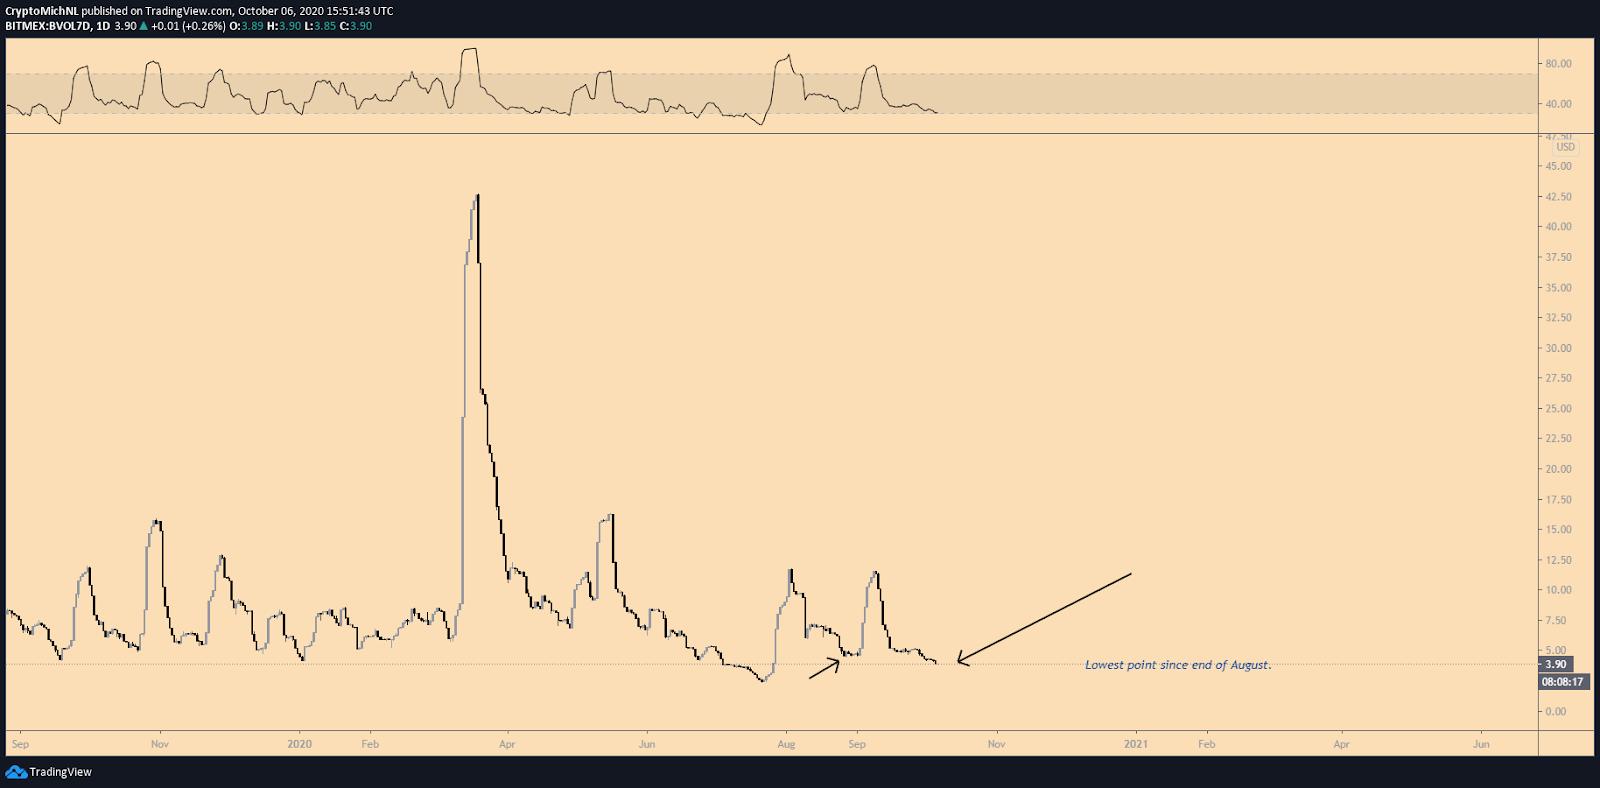 Bitcoin 7 day volatility index